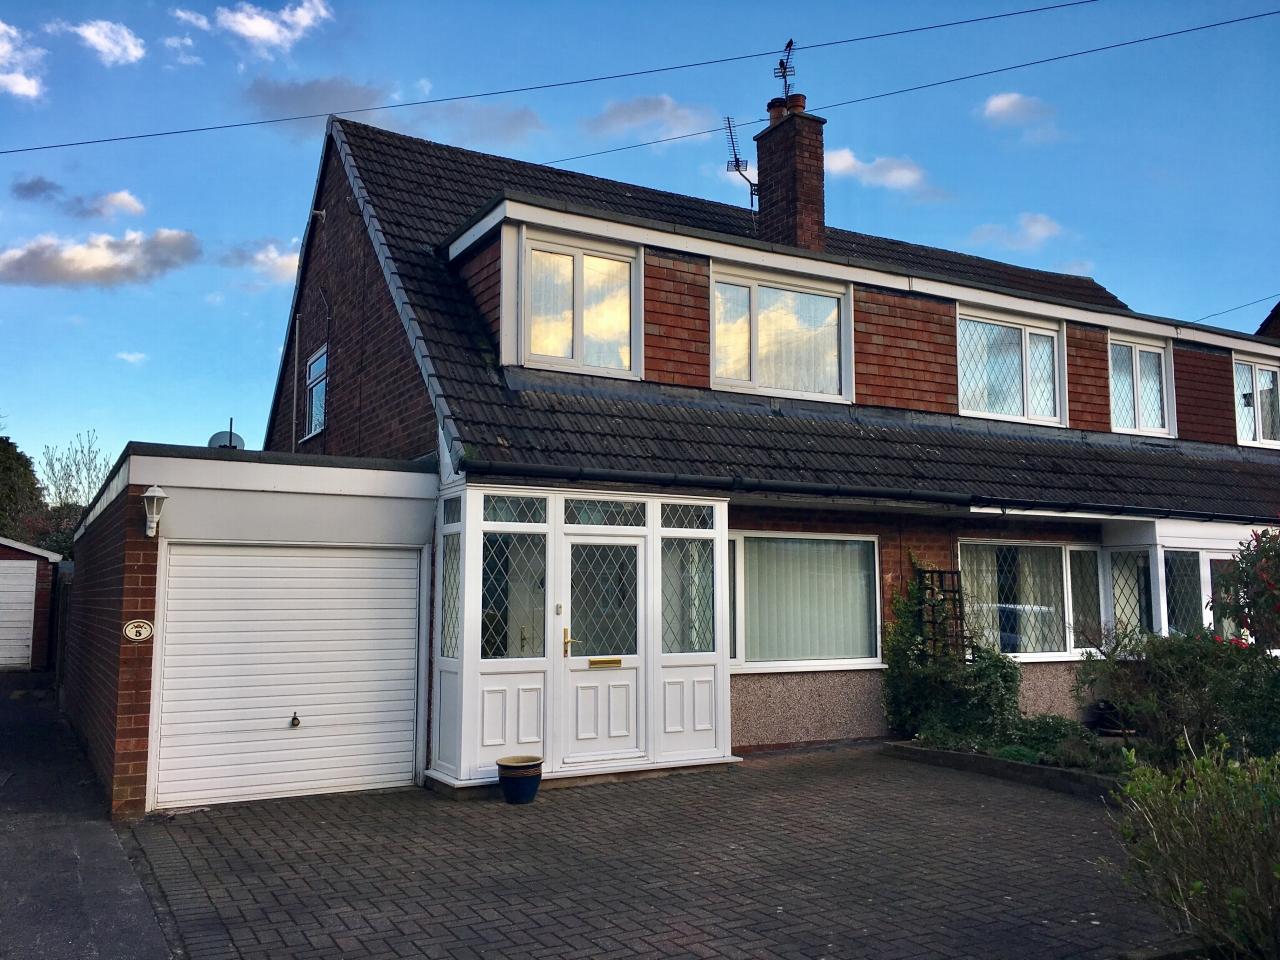 3 Bedroom Semi-detached House For Sale - Image 1